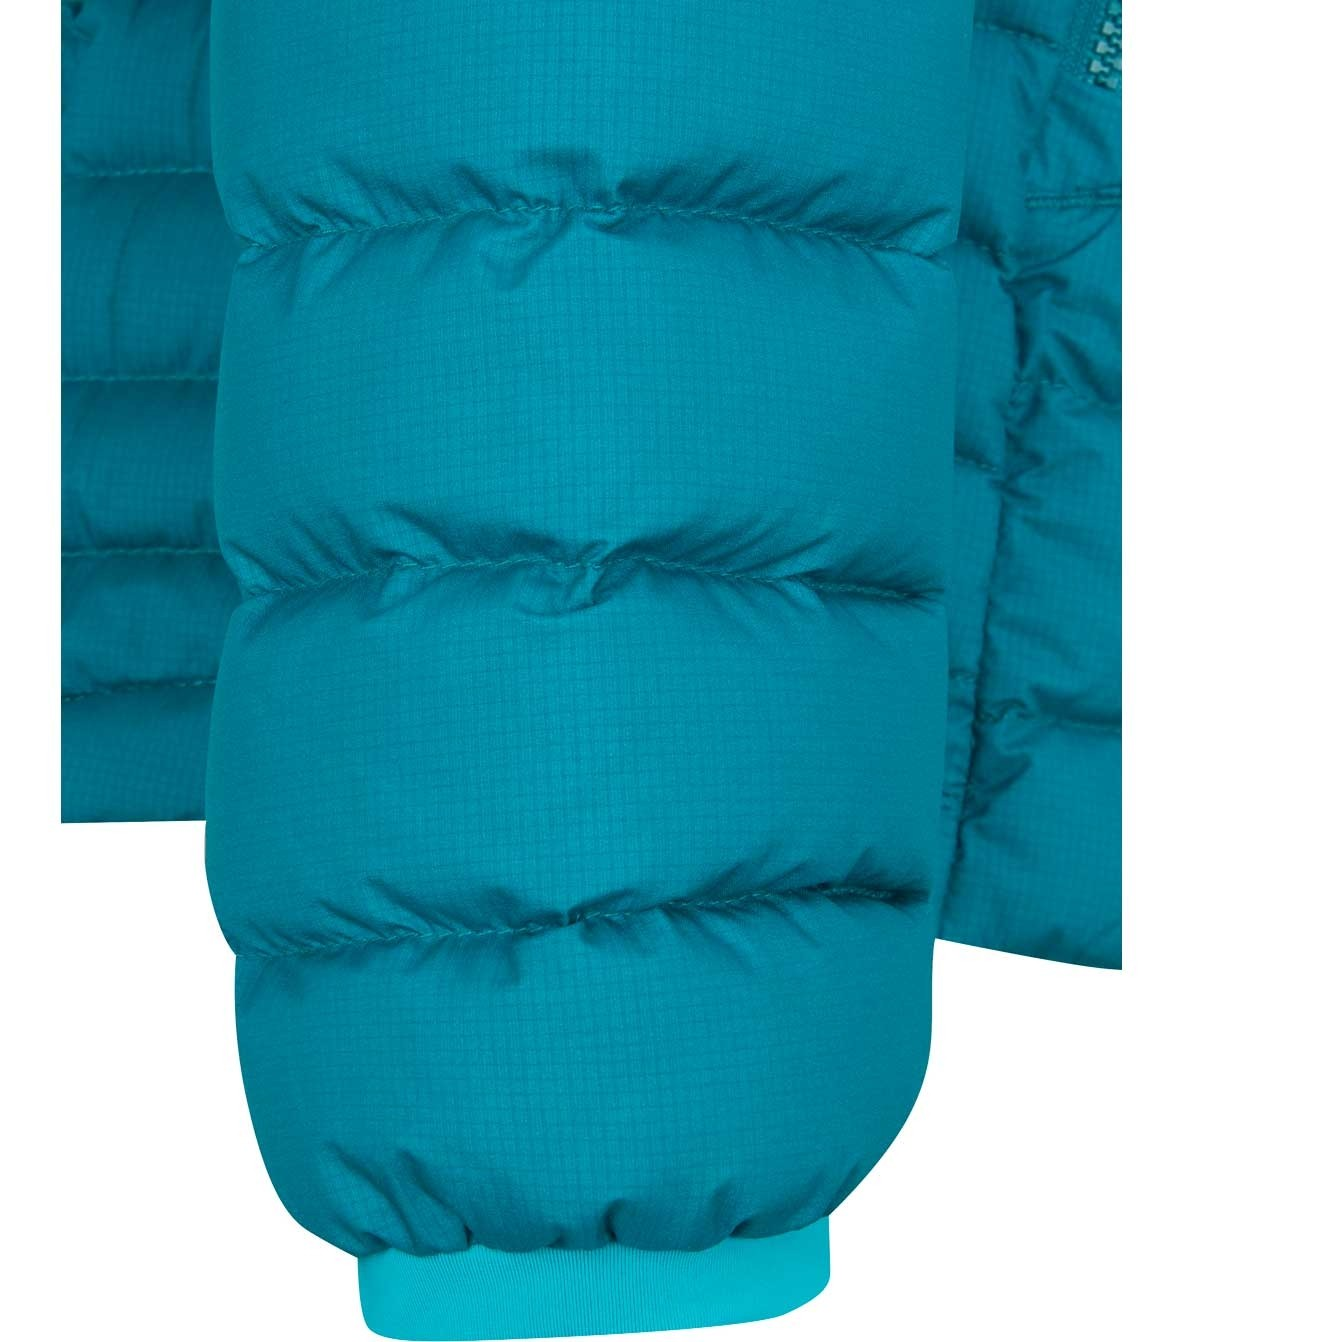 Rab Infinity Microlight Down Jacket - Women's - Ultramarine